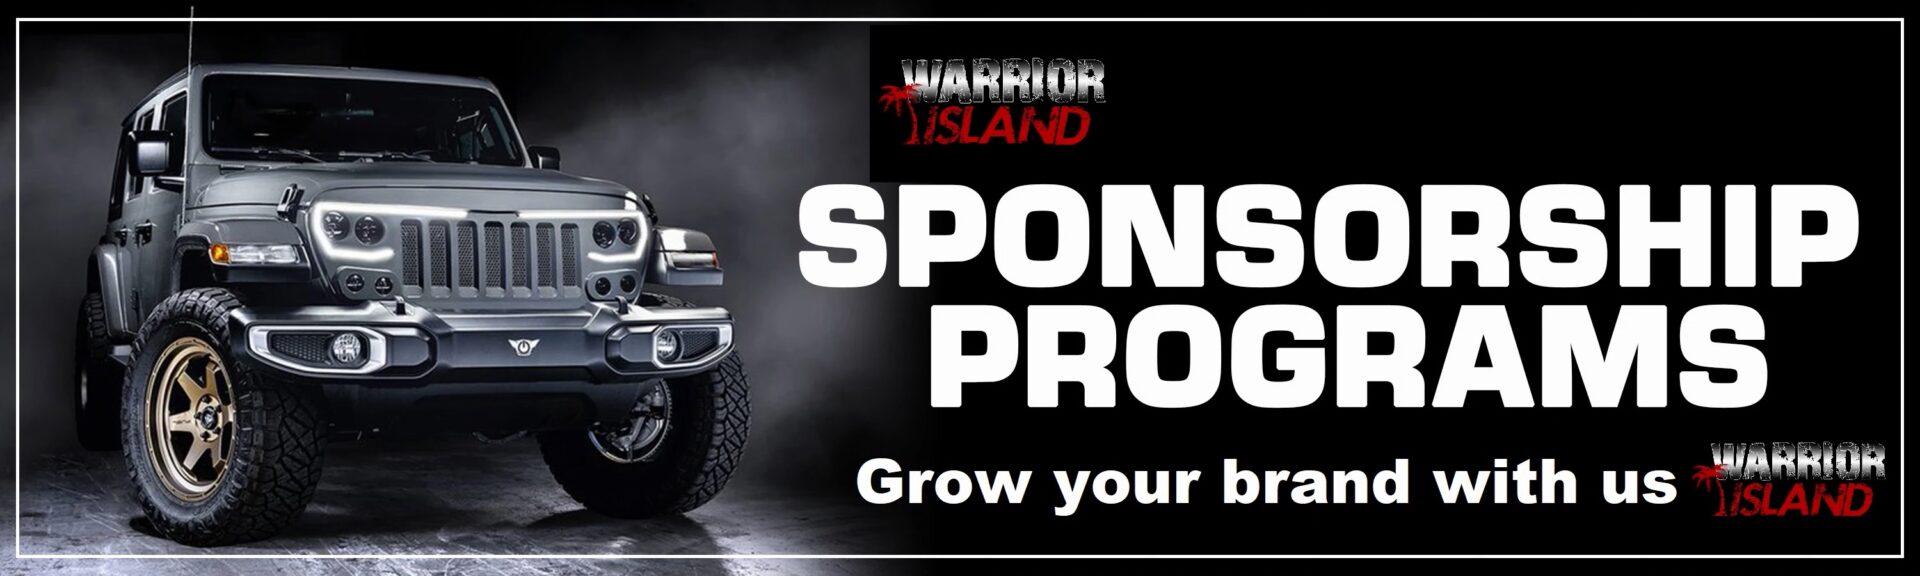 SponsorHeaderWarriorIsland